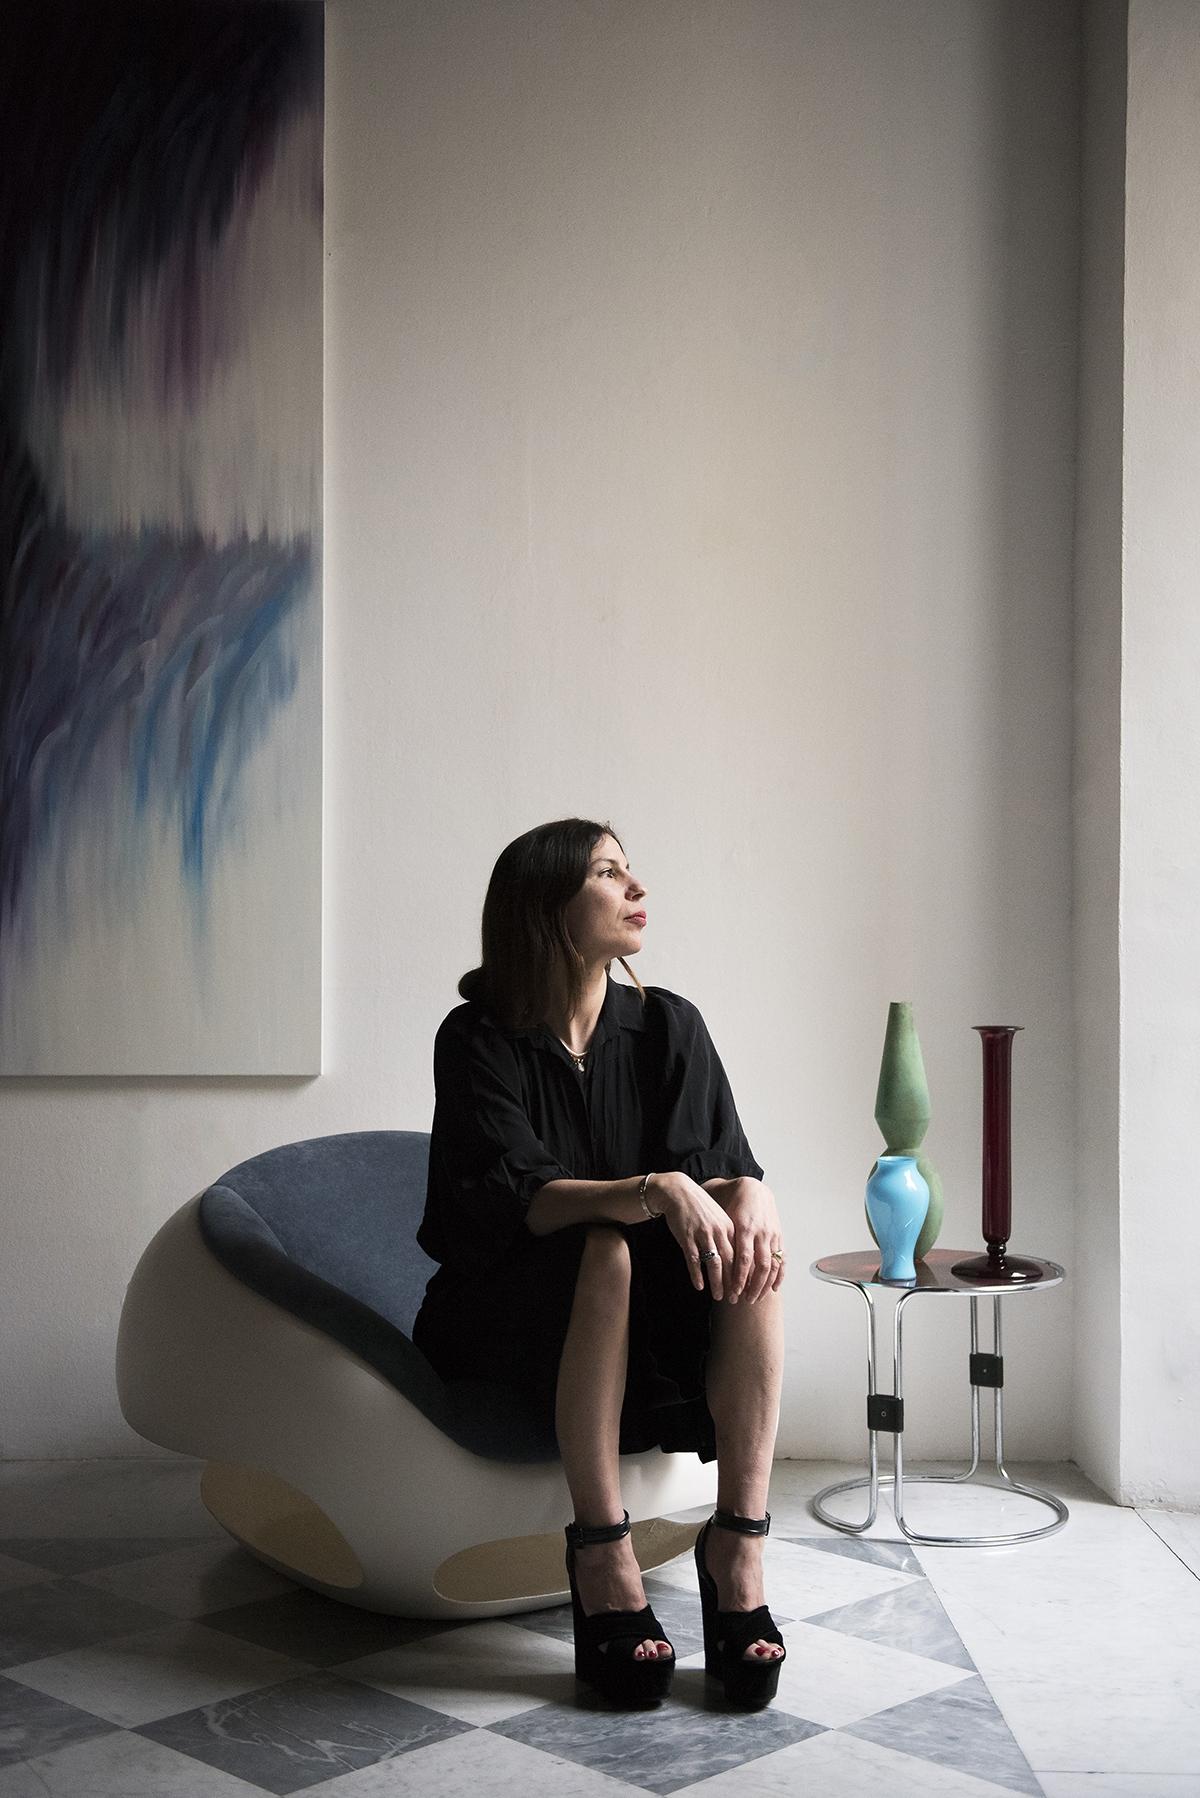 Giorgia Cerulli (foto di Paolo Abate)